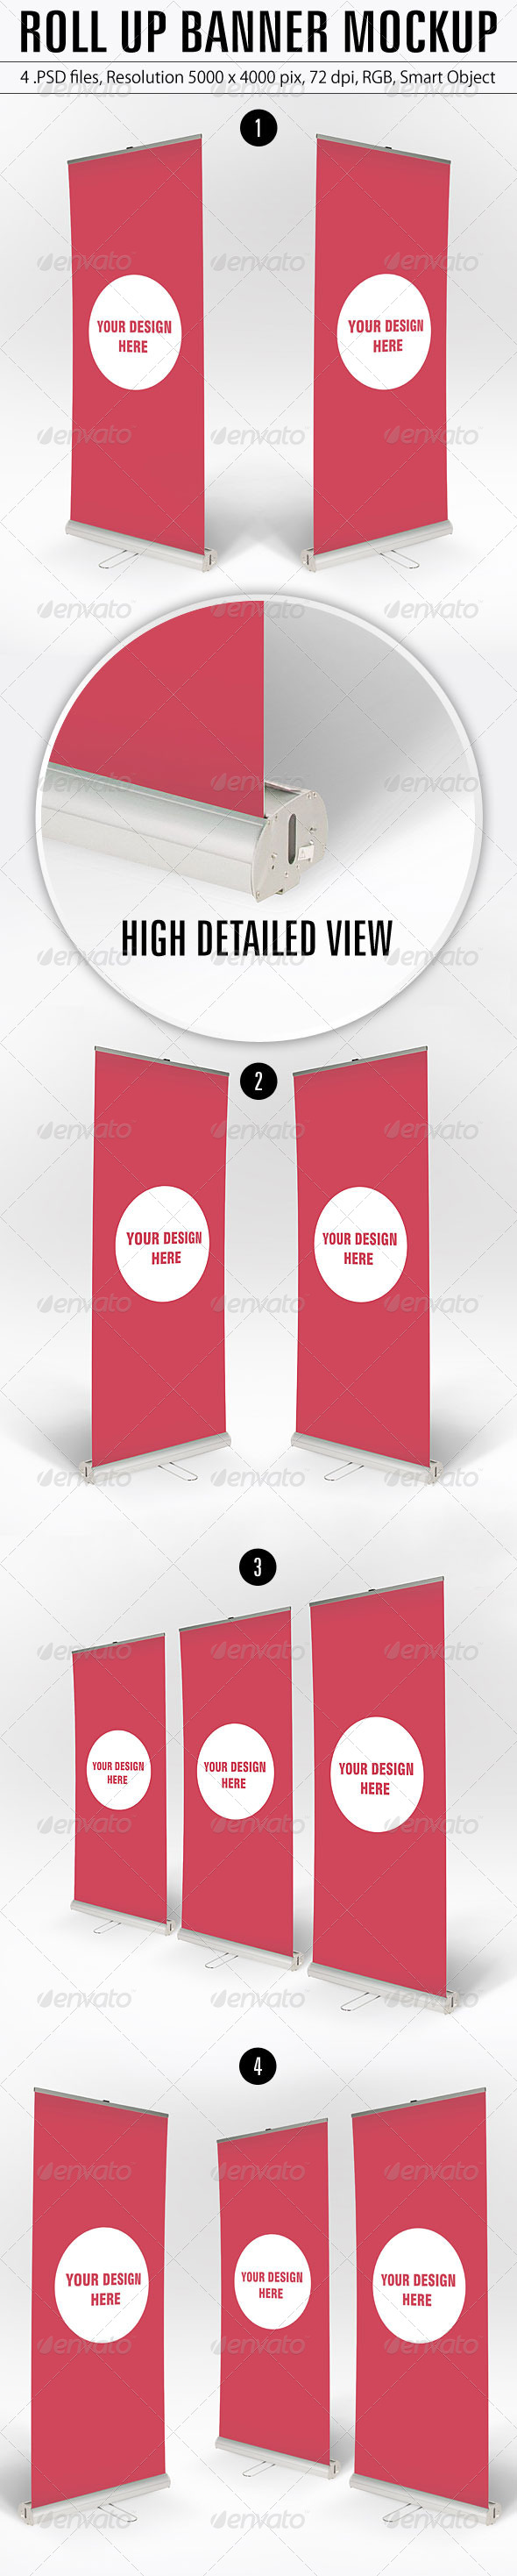 Roll Up Banner Mockup - Product Mock-Ups Graphics